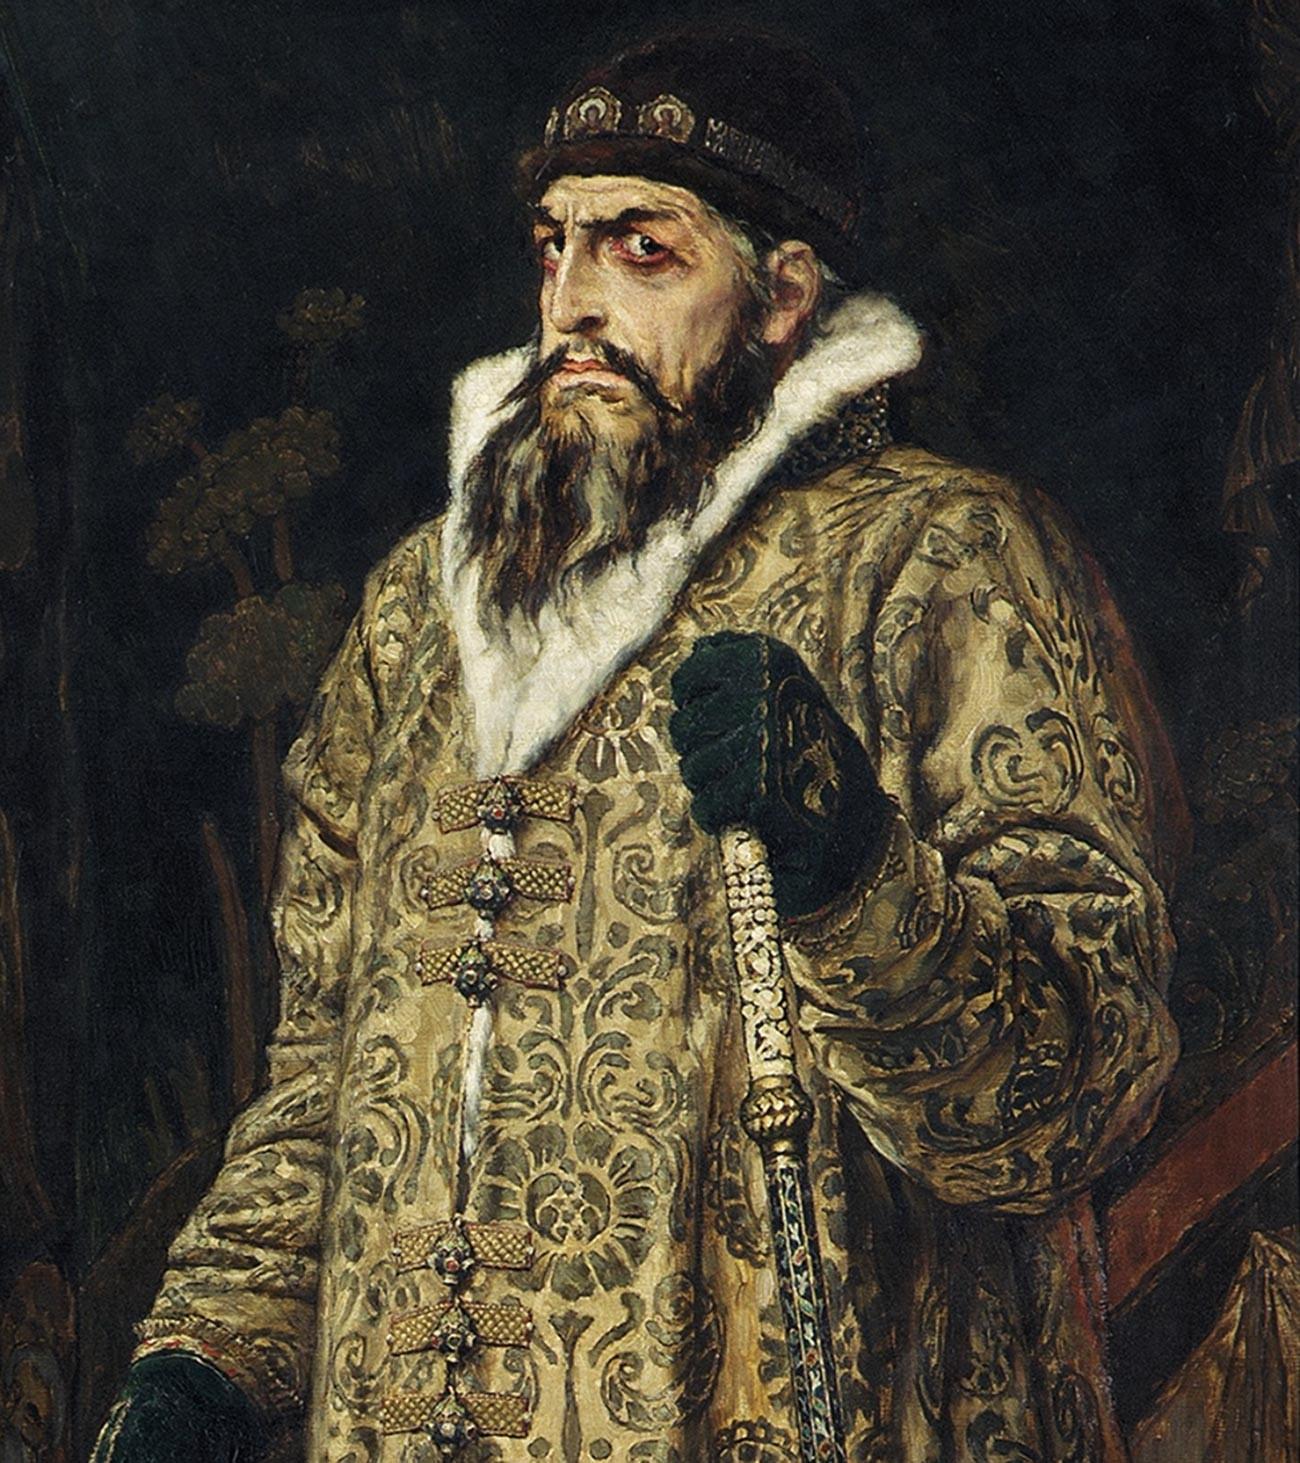 Potret Ivan IV yang Mengerikan oleh Viktor Vasnetsov, 1897